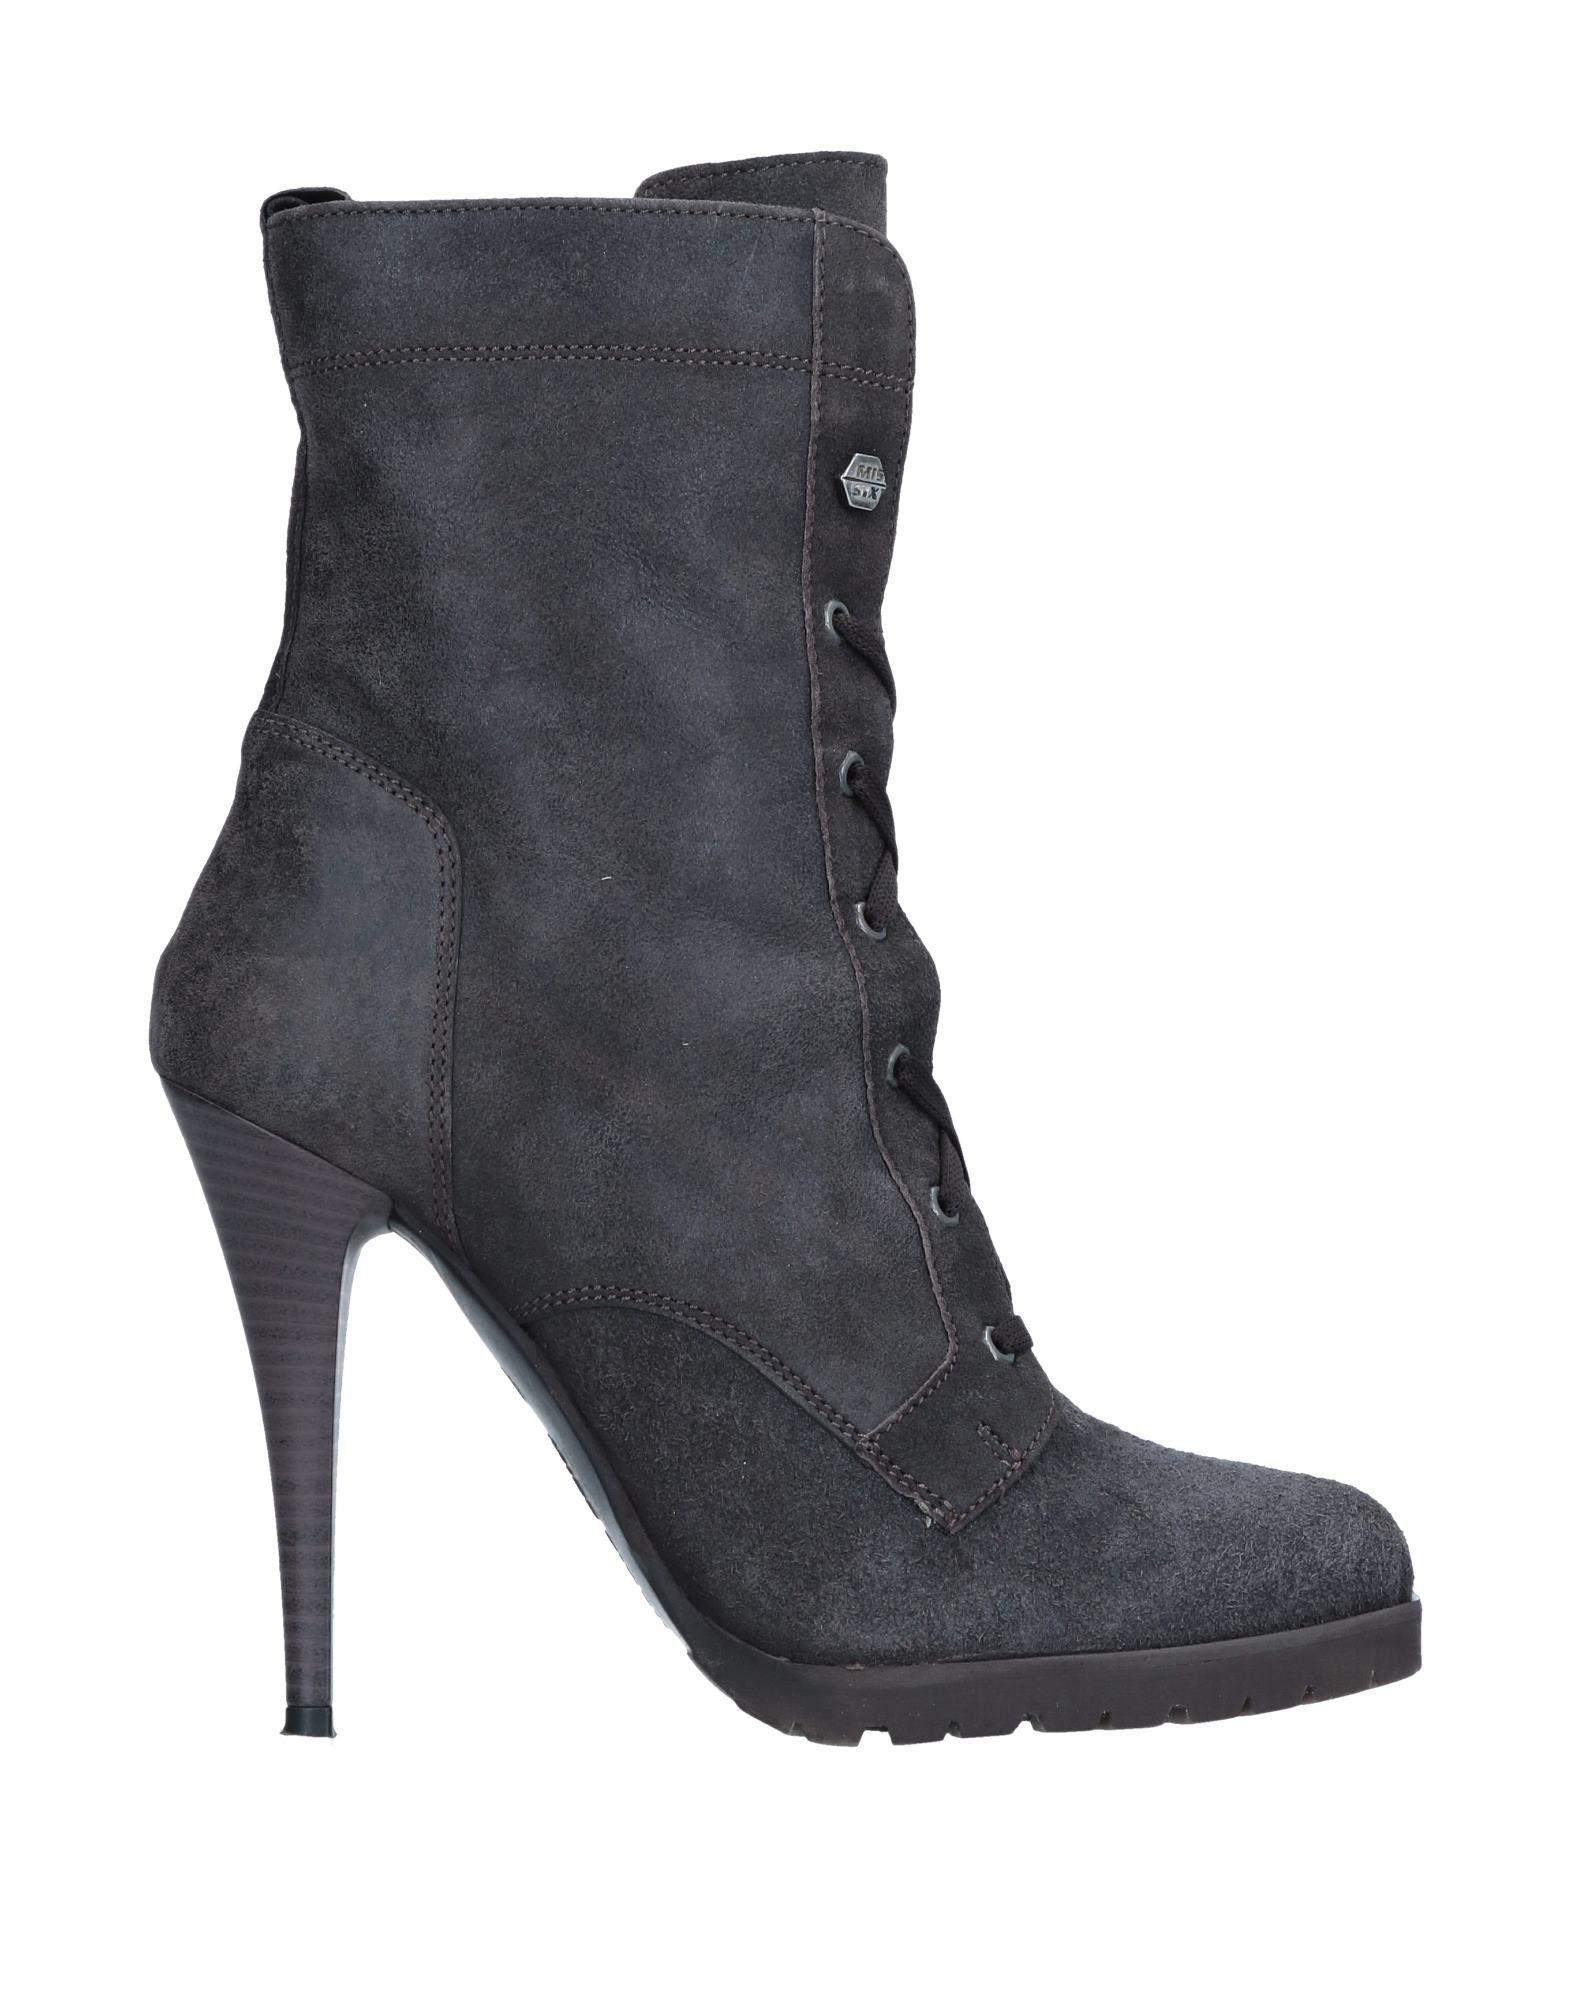 MISS SIXTY Полусапоги и высокие ботинки miss unique полусапоги и высокие ботинки